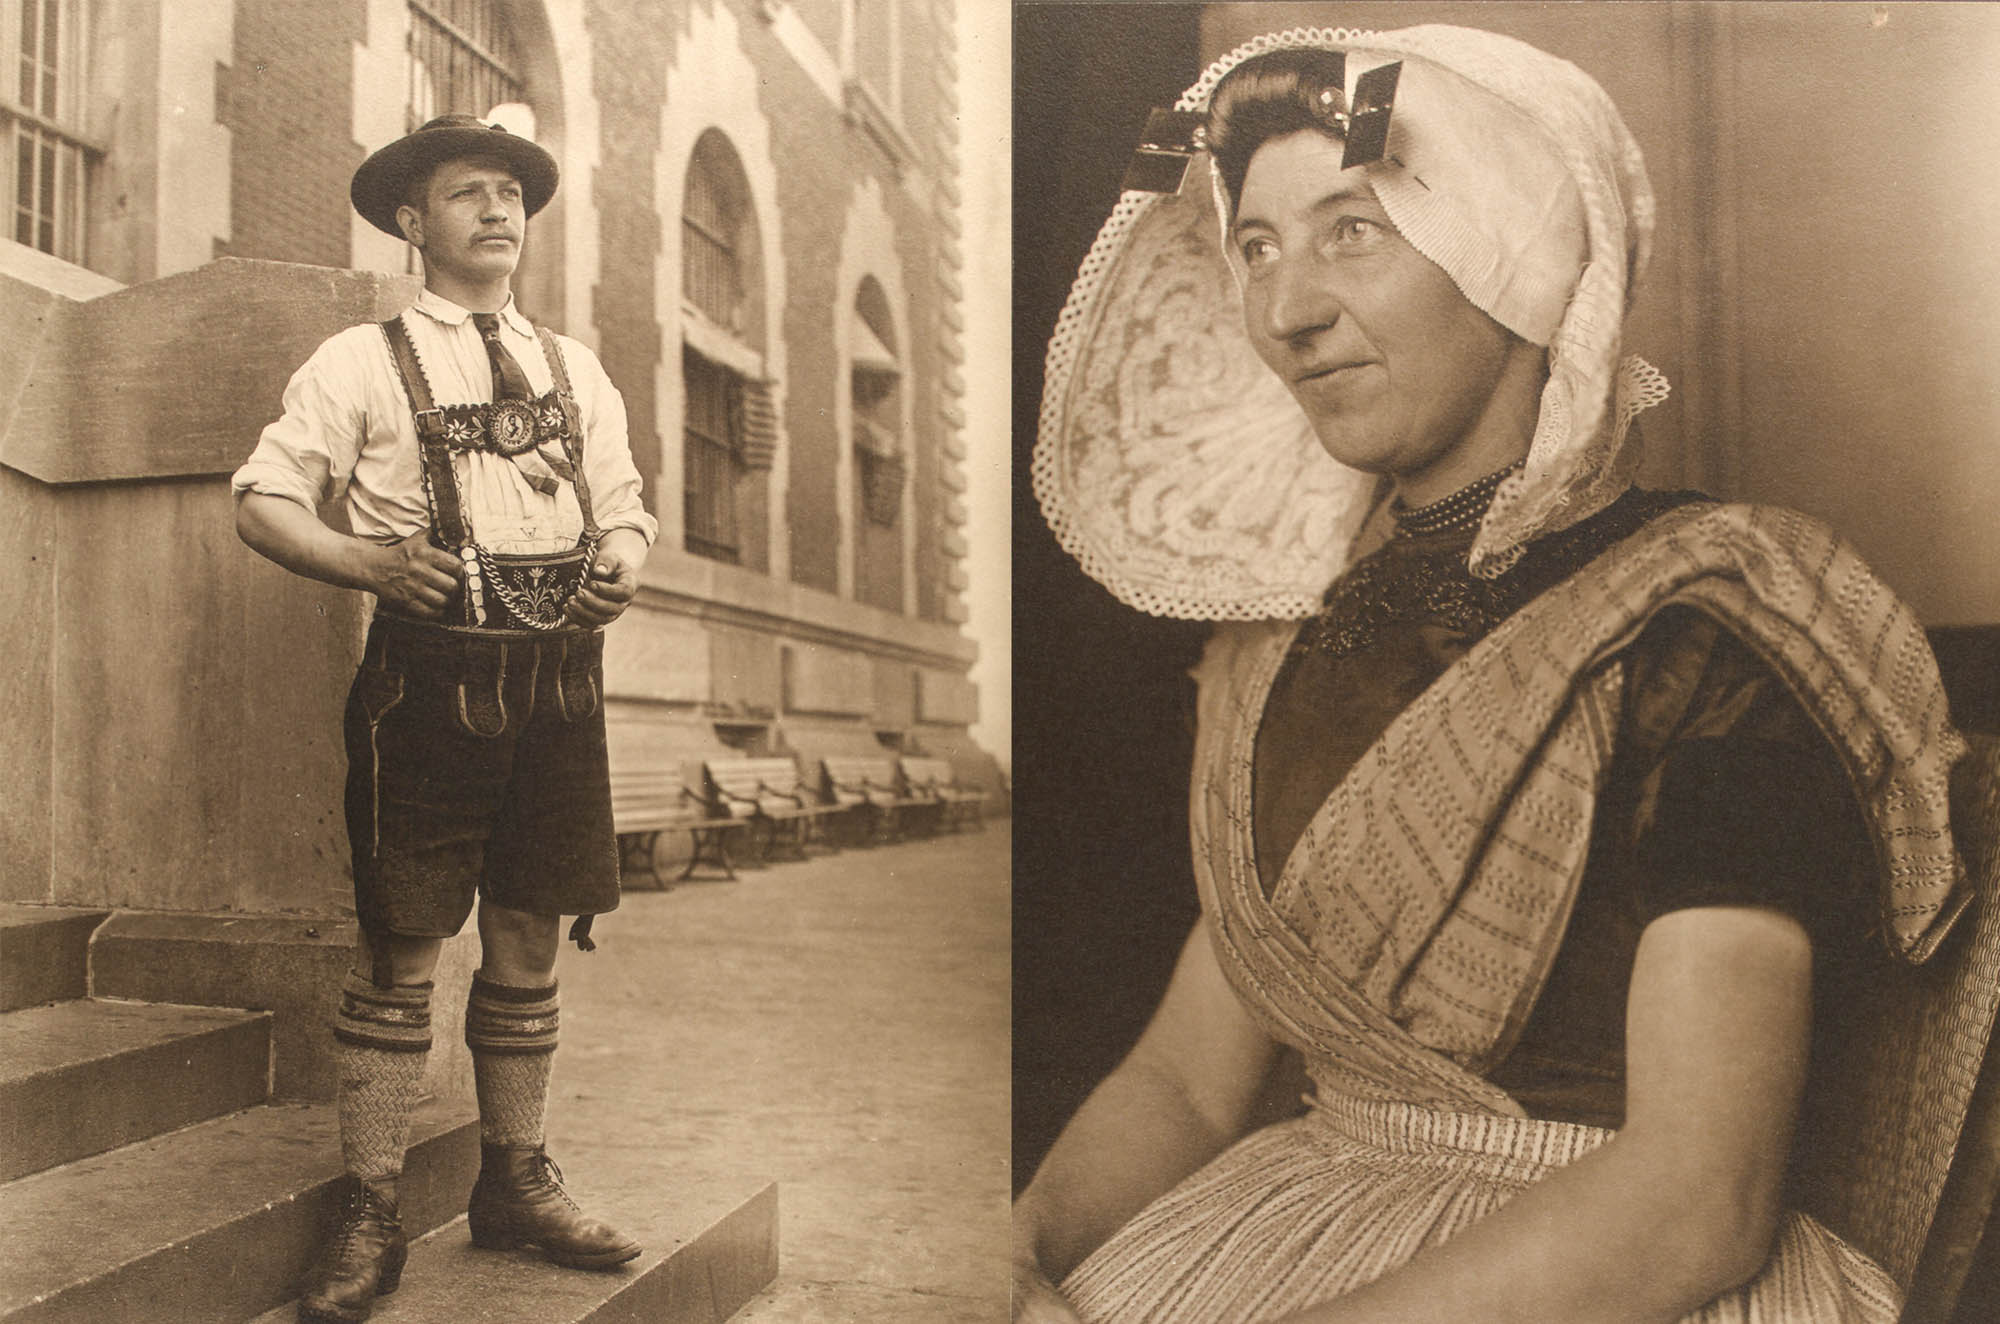 Man in lederhosen, left, and woman in Dutch native dress, right (NPS Photos)